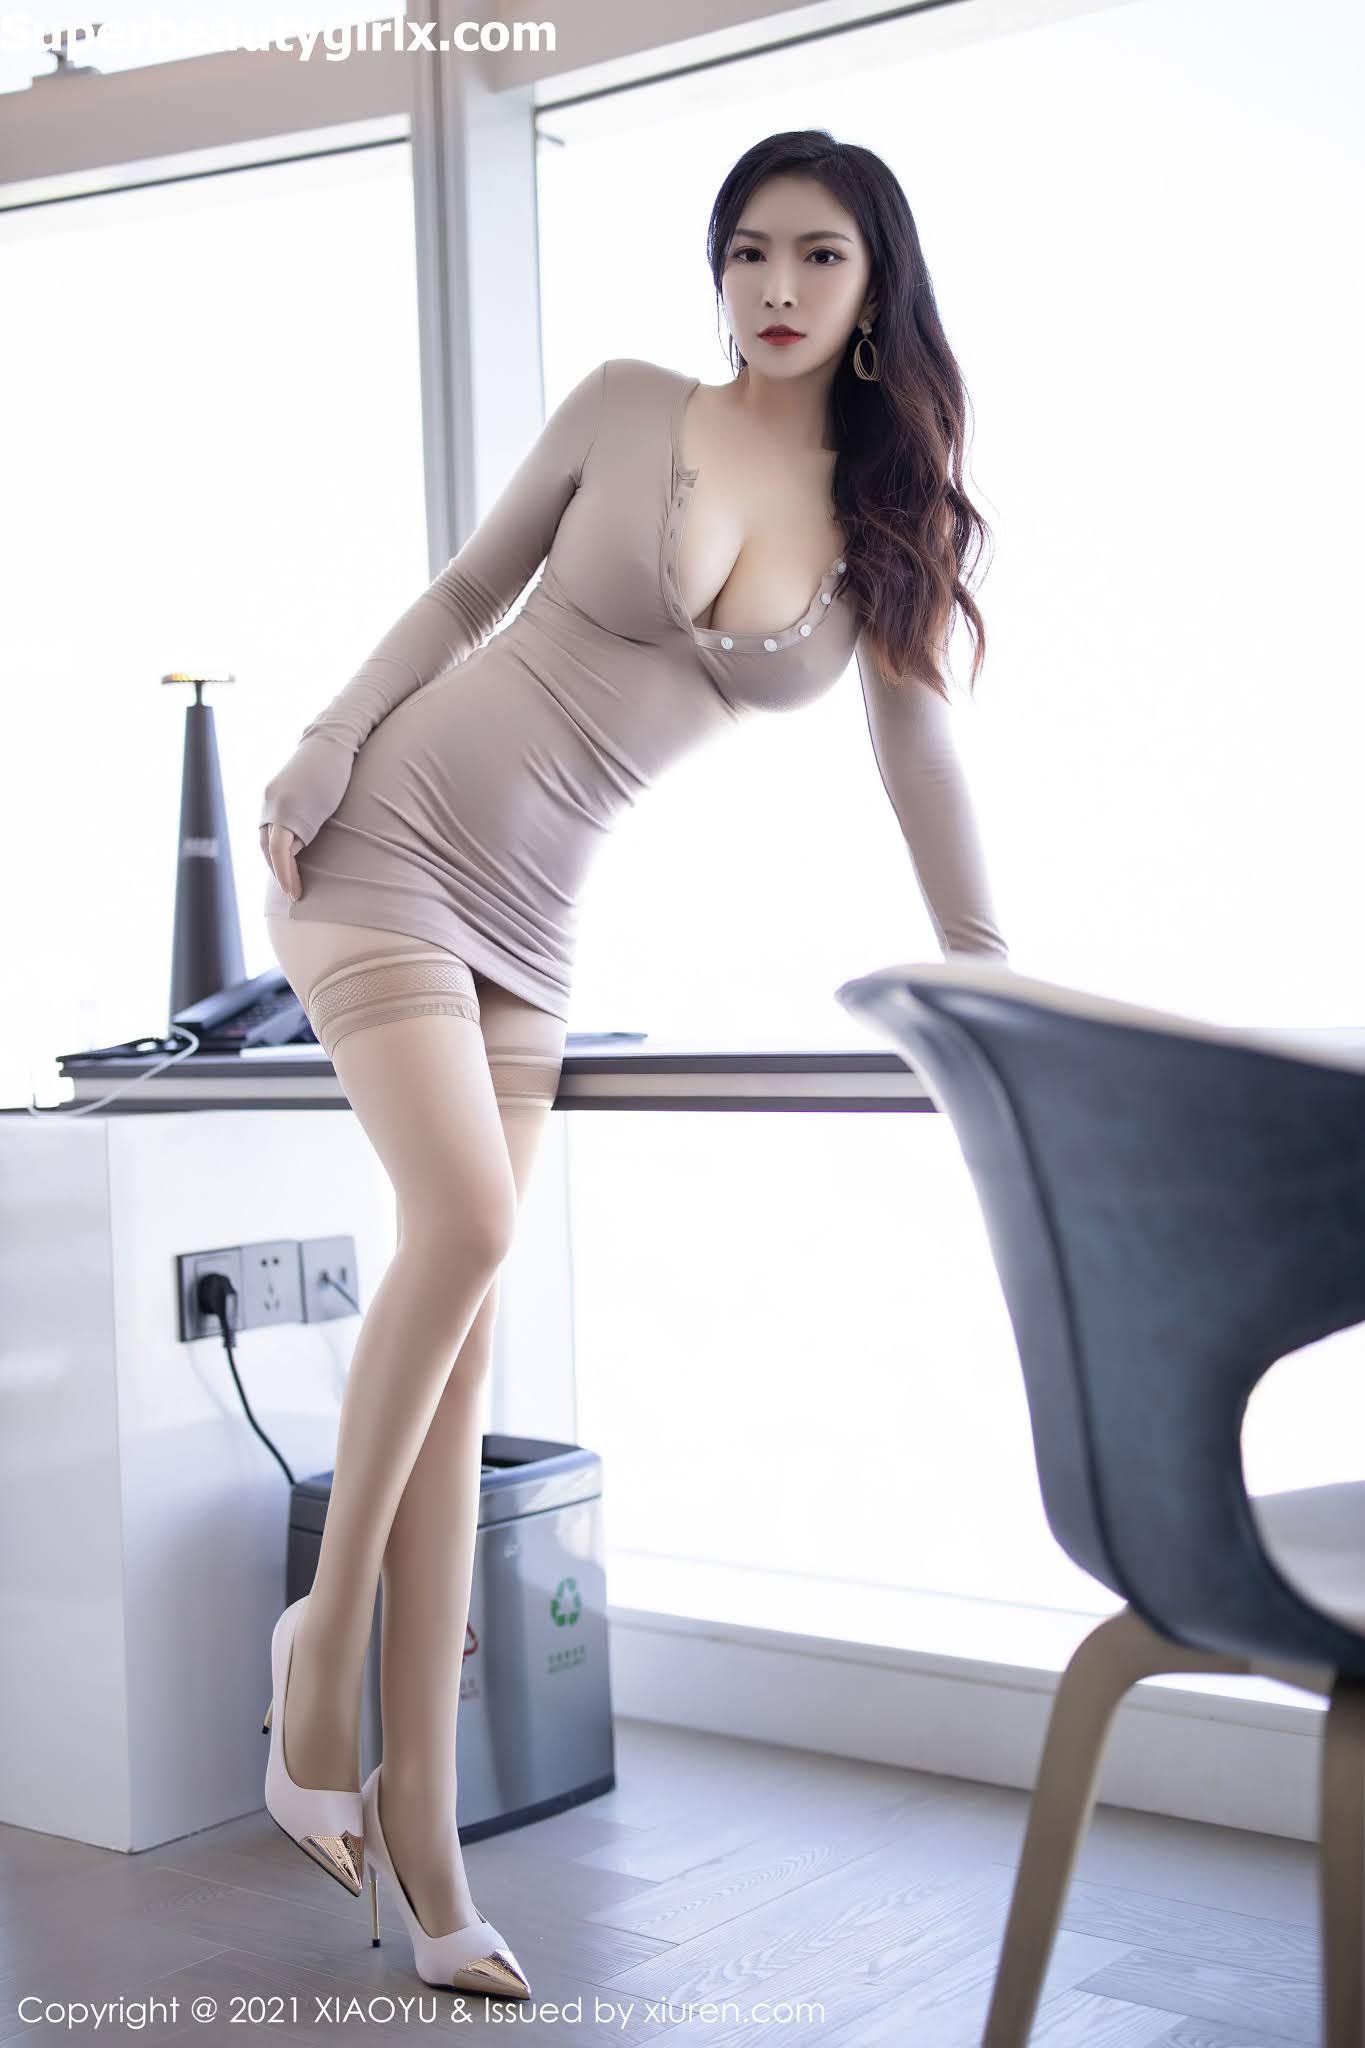 XiaoYu-Vol.484-mina-Superbeautygirlx.com